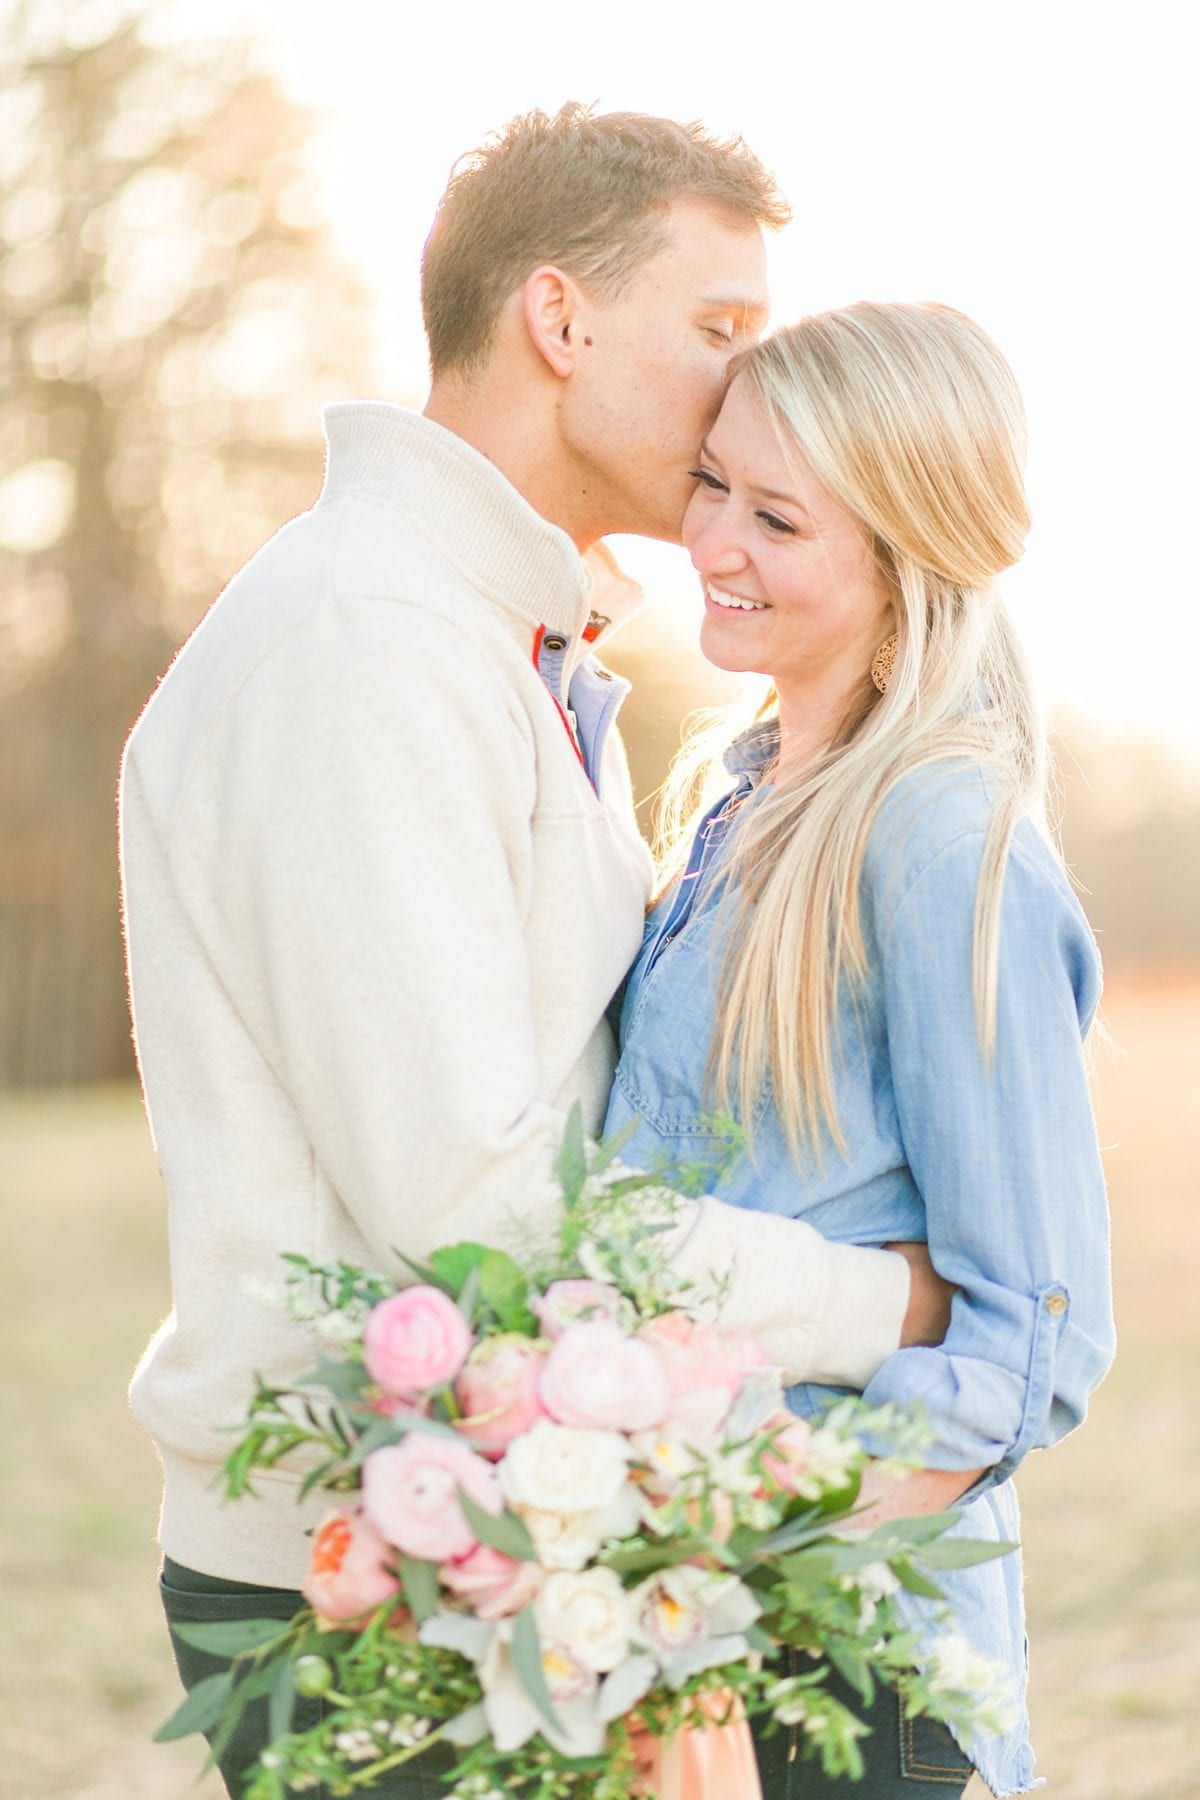 Manassas Battlefield Engagement Session Virginia Wedding Photographer Danielle & Charlie Megan Kelsey Photography-5626.jpg